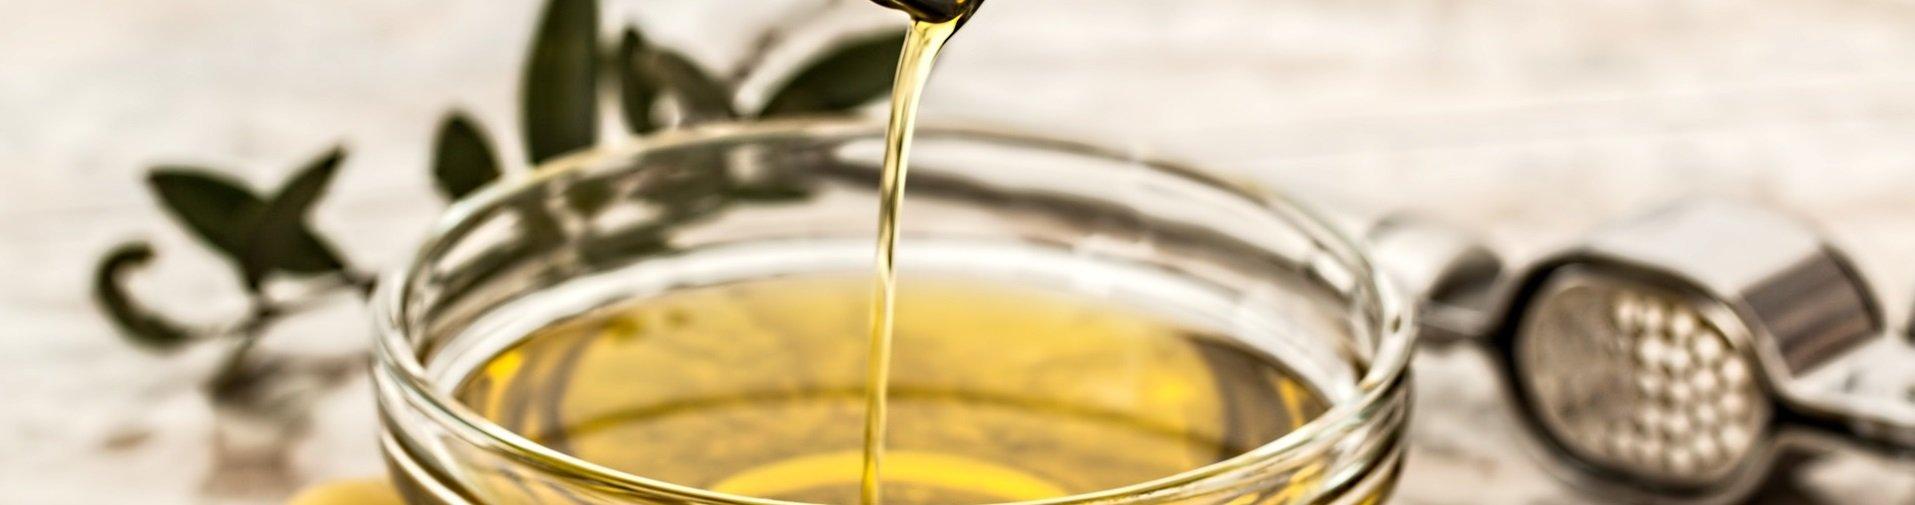 olívaolaj natúrkozmetikum